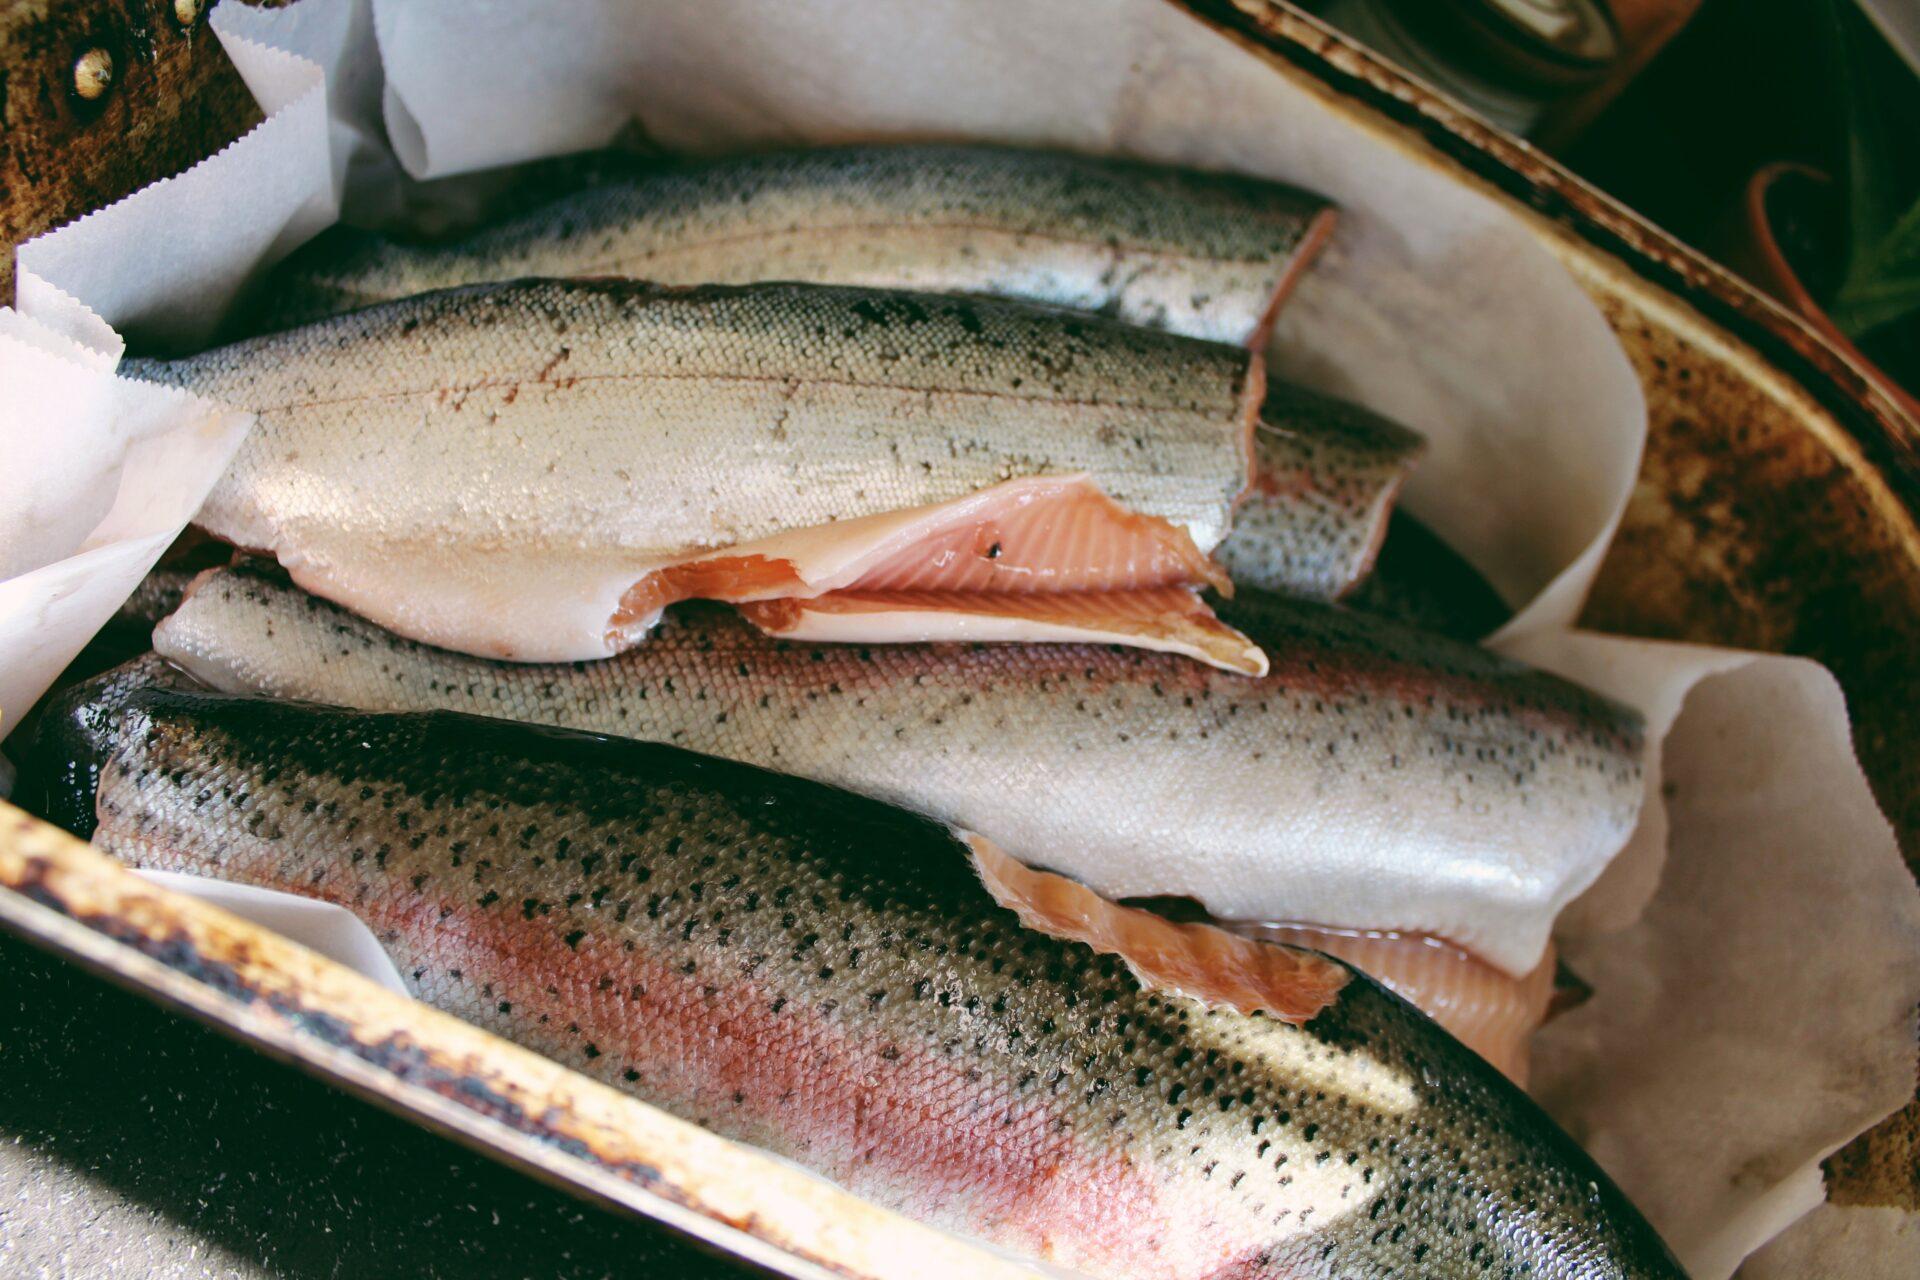 Rainbow trout. Credit: Raeanne O'Meara.